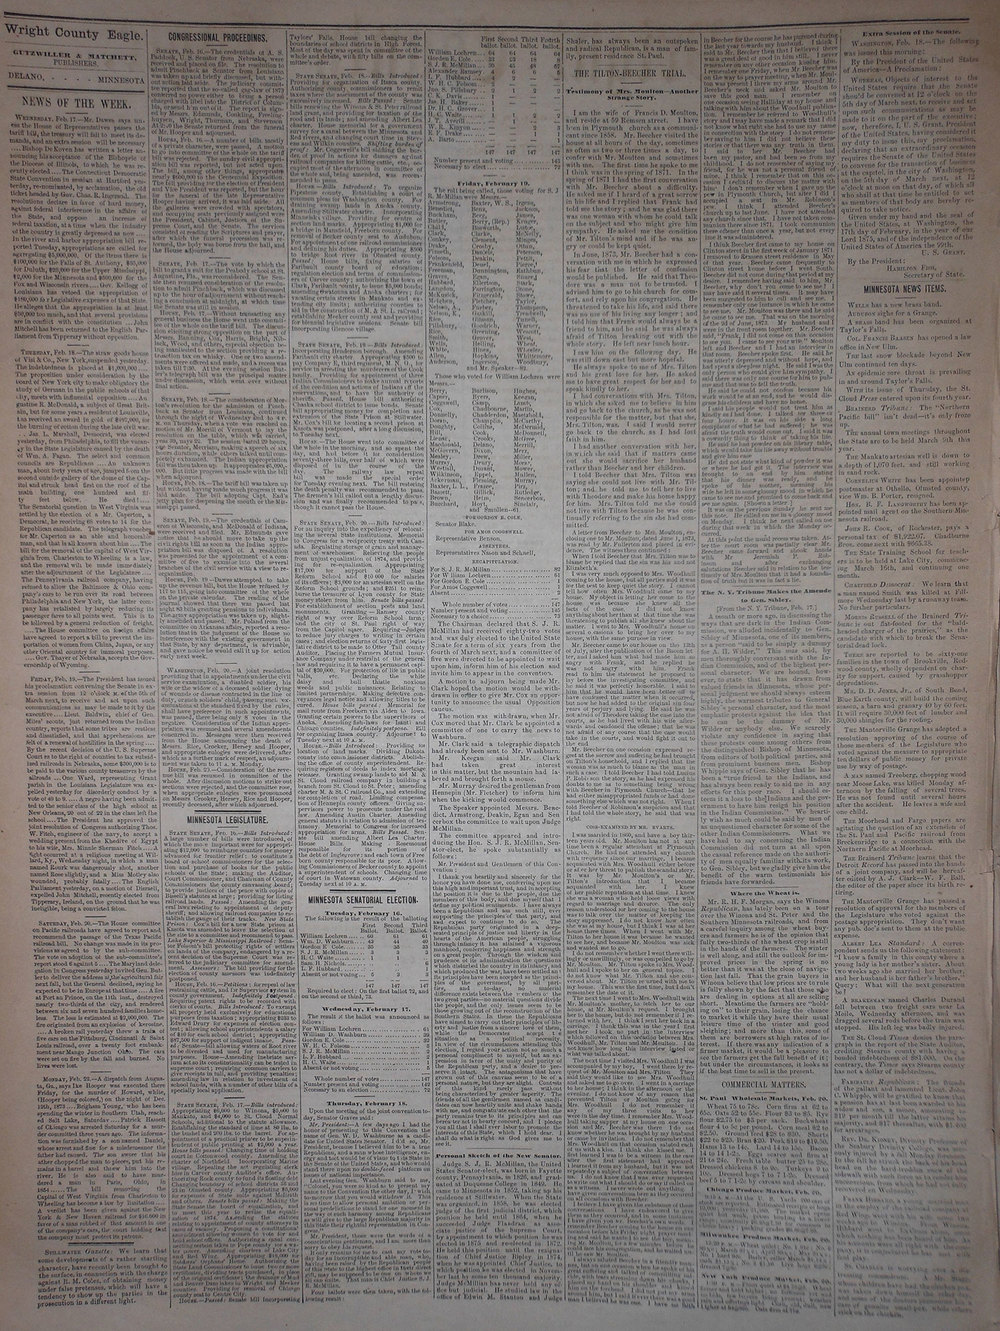 2/24/1875, p2